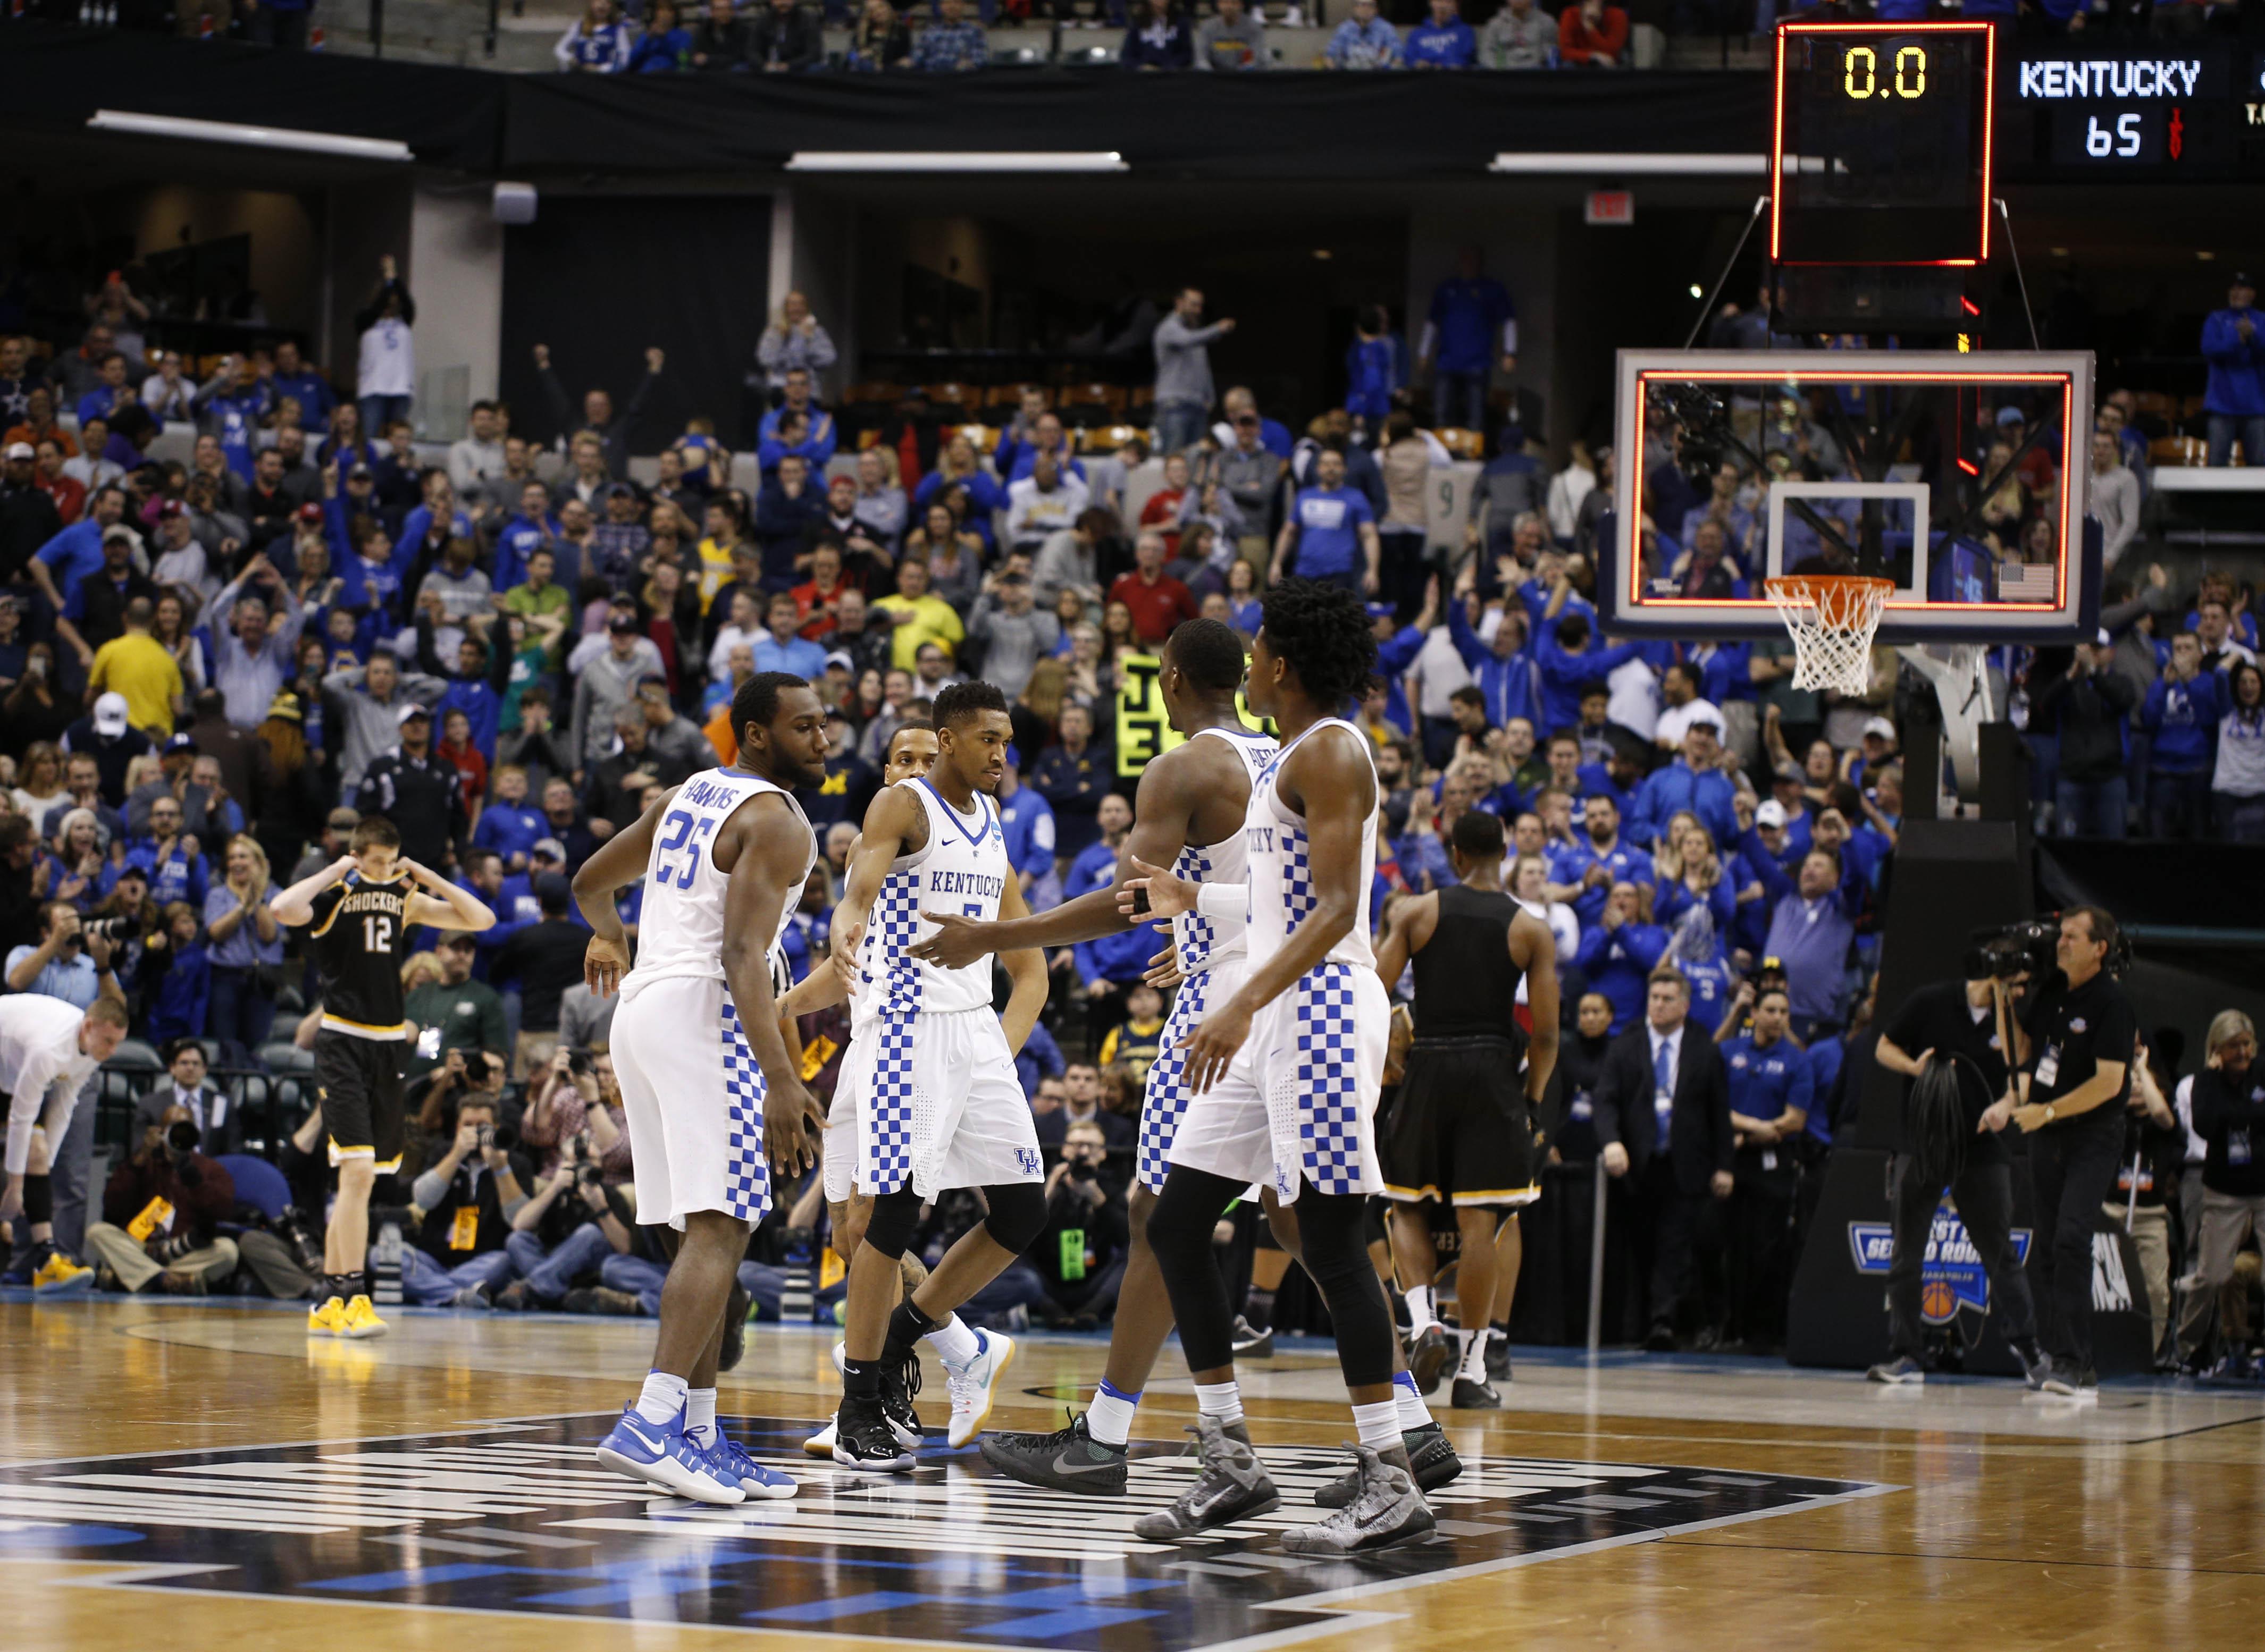 9958033-ncaa-basketball-ncaa-tournament-second-round-kentucky-vs-wichita-state-1